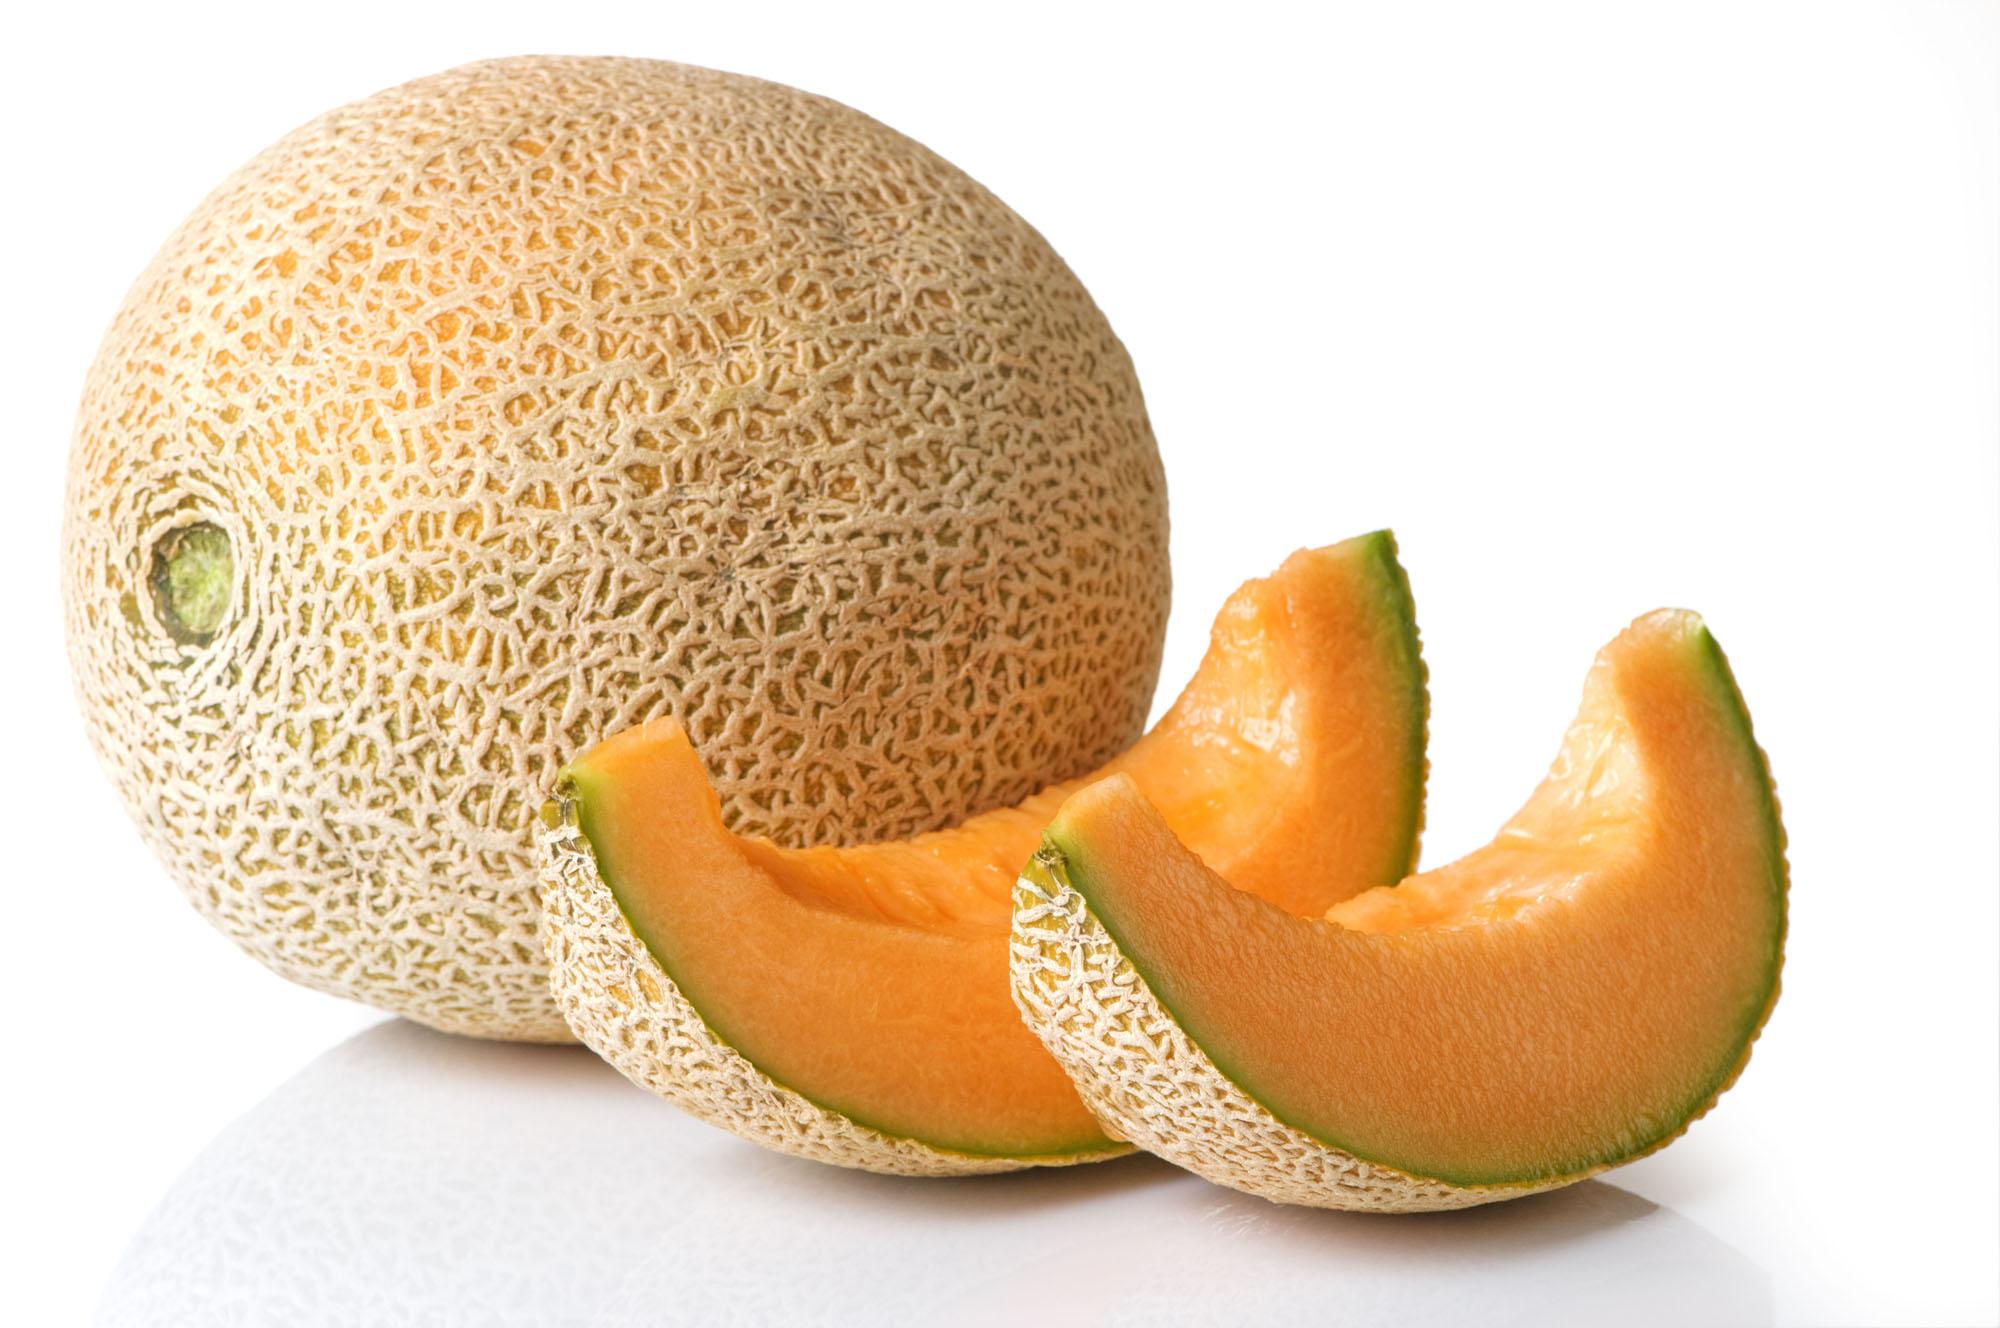 Melon Cantaloupe, lb